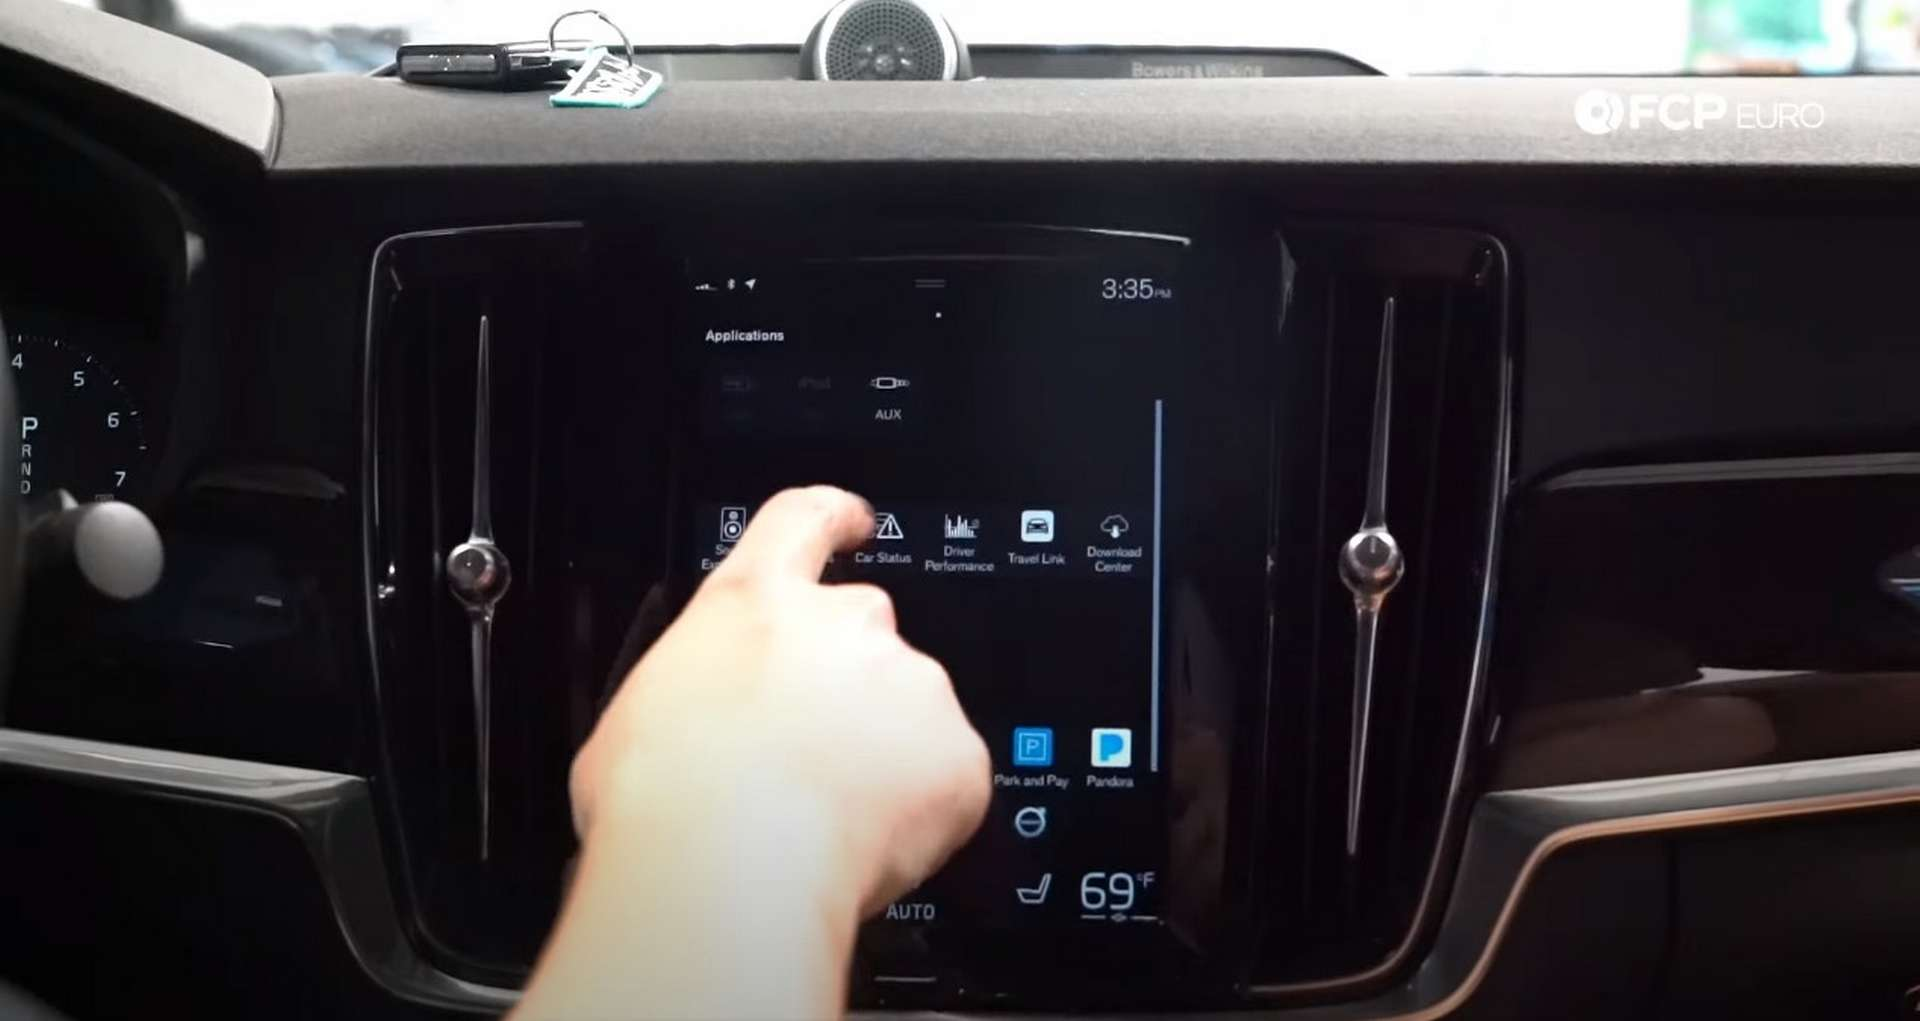 DIY Volvo SPA Oil Change selecting the car status app